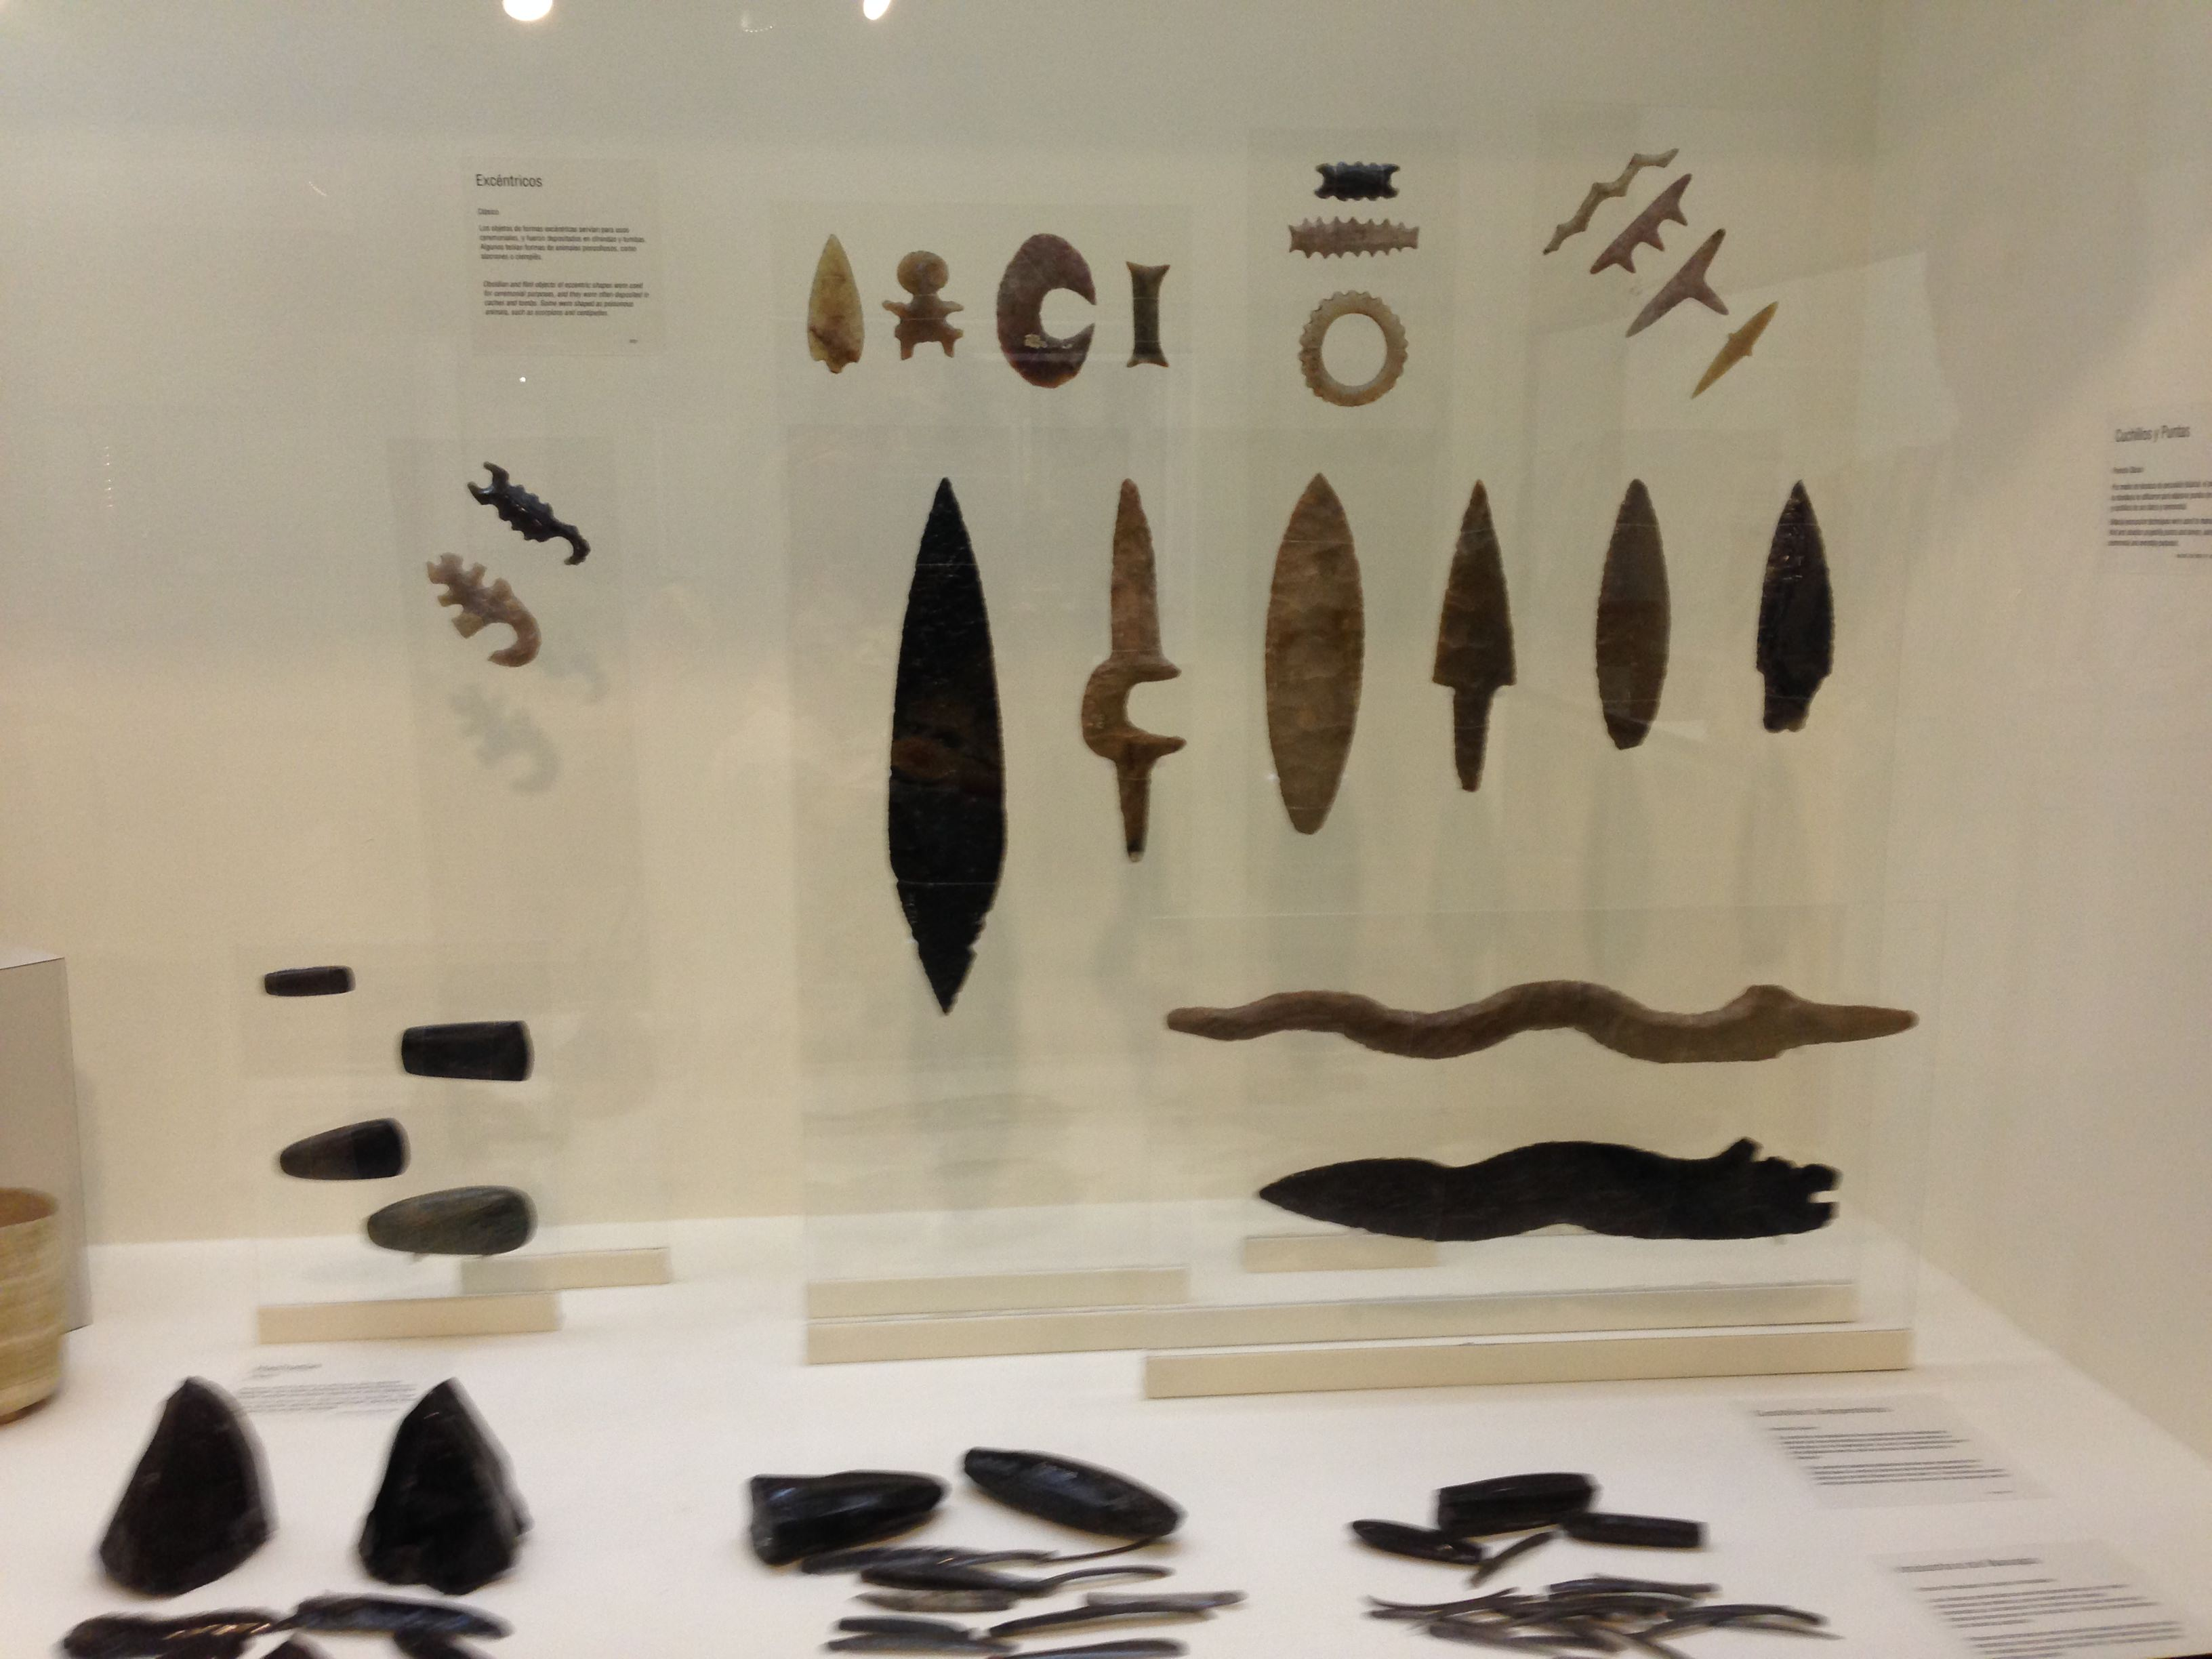 Mayan sacrifice tools